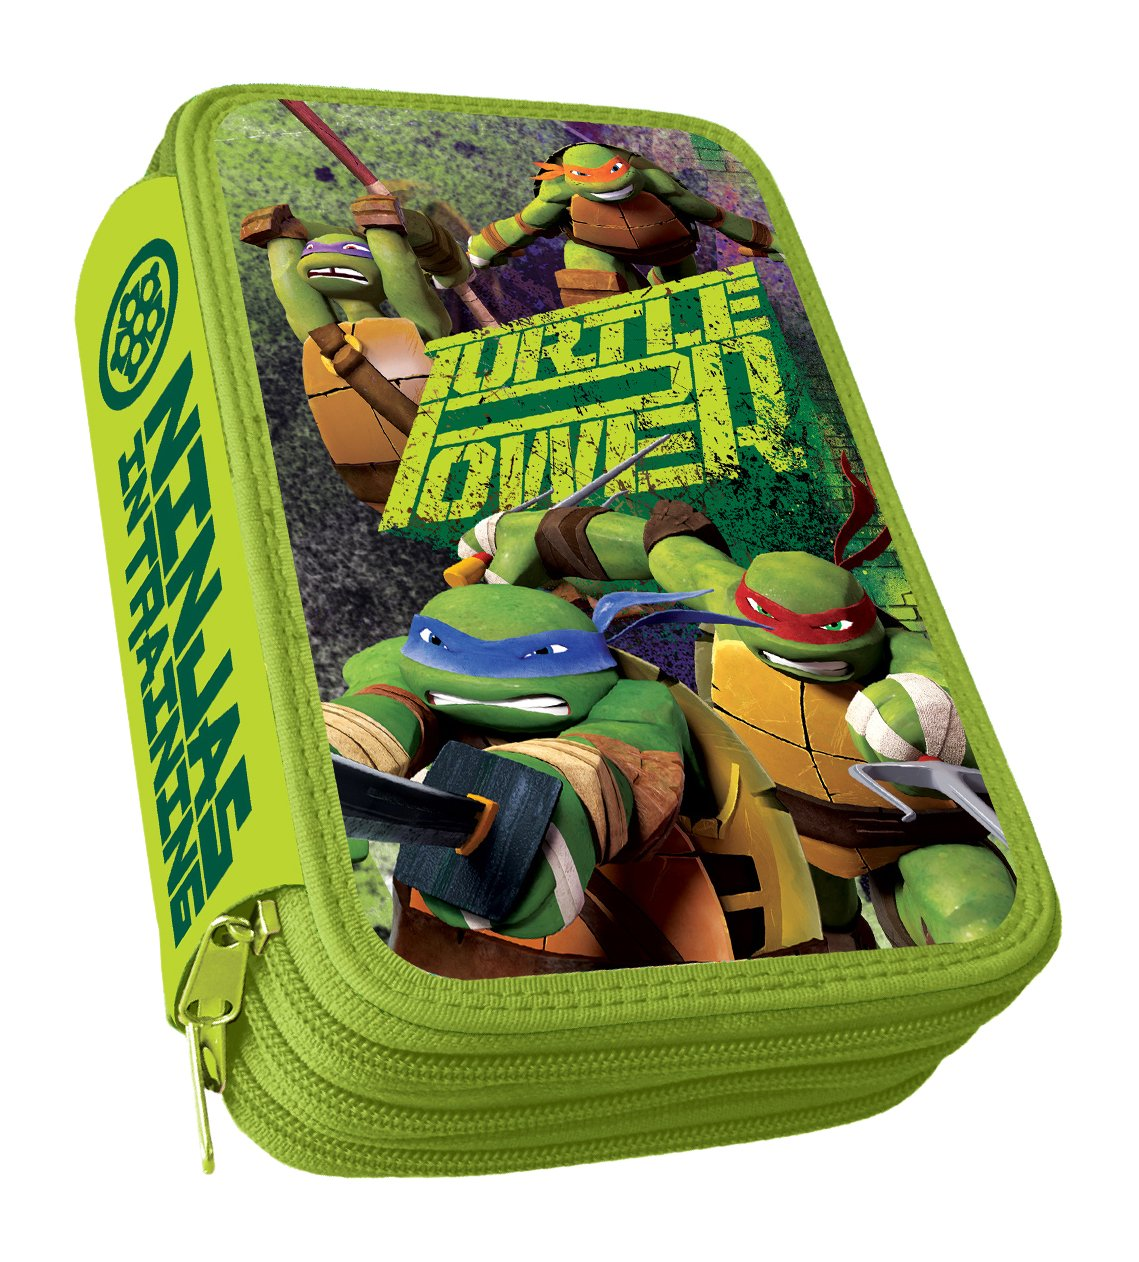 Astro Ninja Turtle Federmäppchen mit 3 Reißverschlüssen: Amazon.de ...